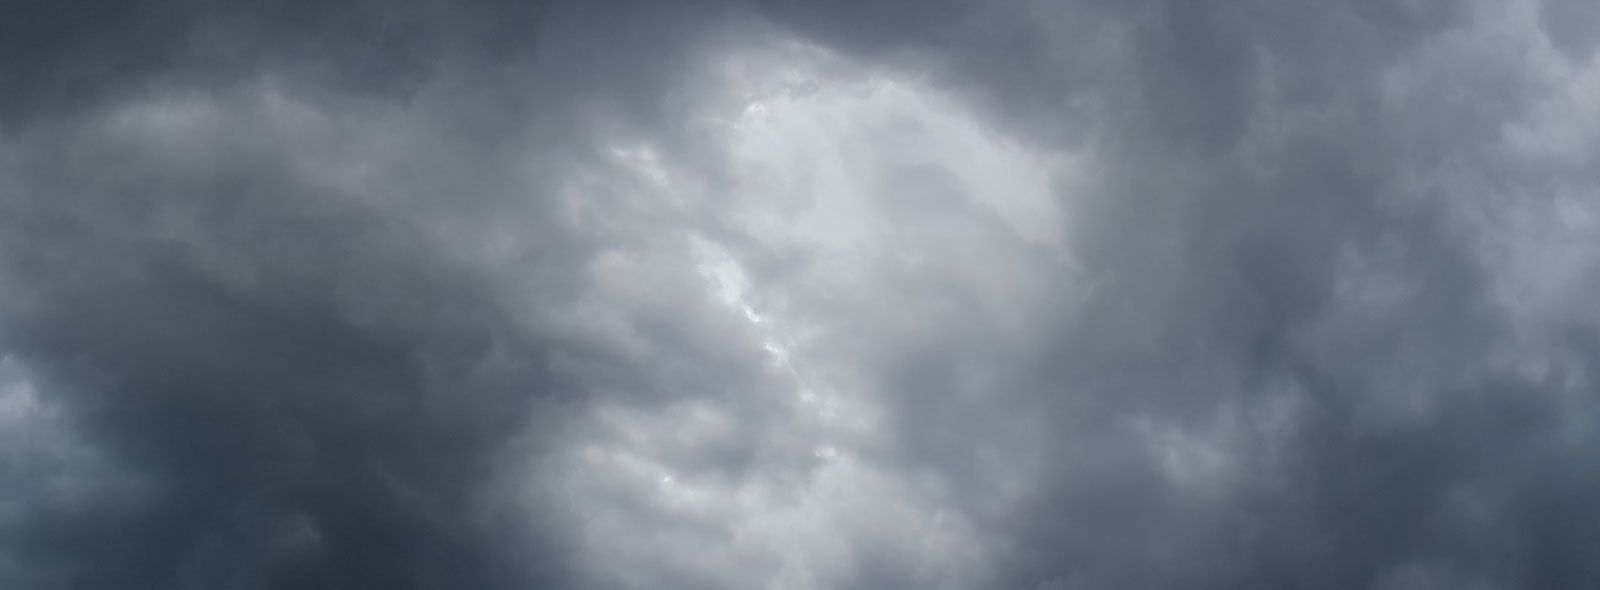 Nuvole basse e scure